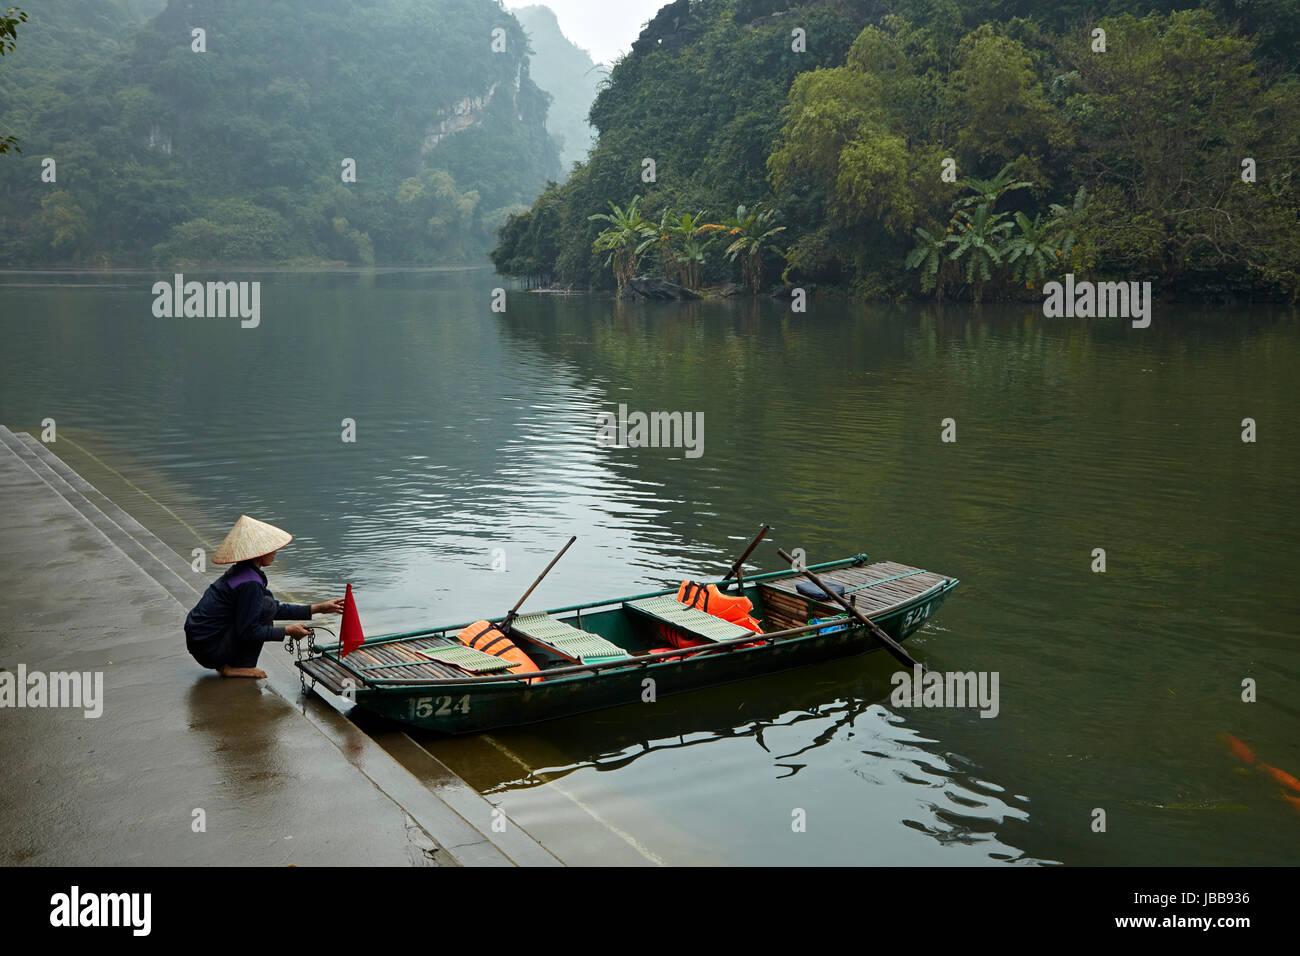 Tourist boat for Trang An Grottoes trip (UNESCO World Heritage Area), near Ninh Binh, Vietnam - Stock Image